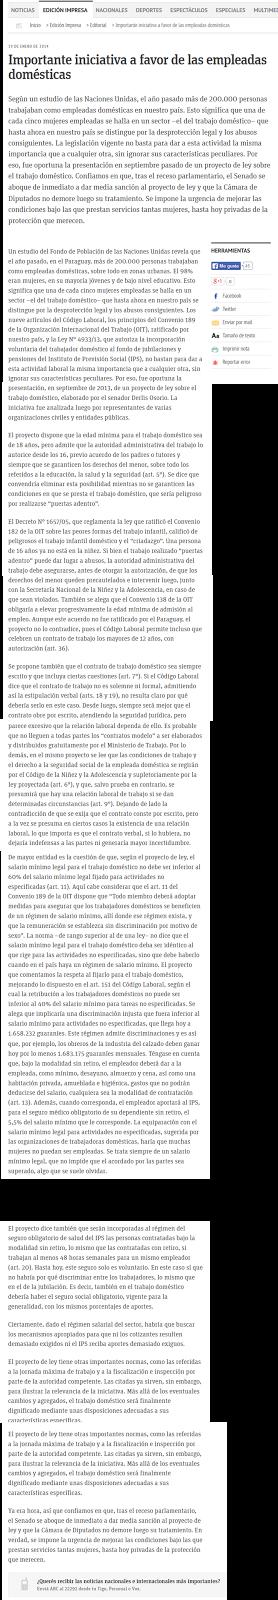 http://www.abc.com.py/edicion-impresa/editorial/importante-iniciativa-a-favor-de-las-empleadas-domesticas-1206894.html